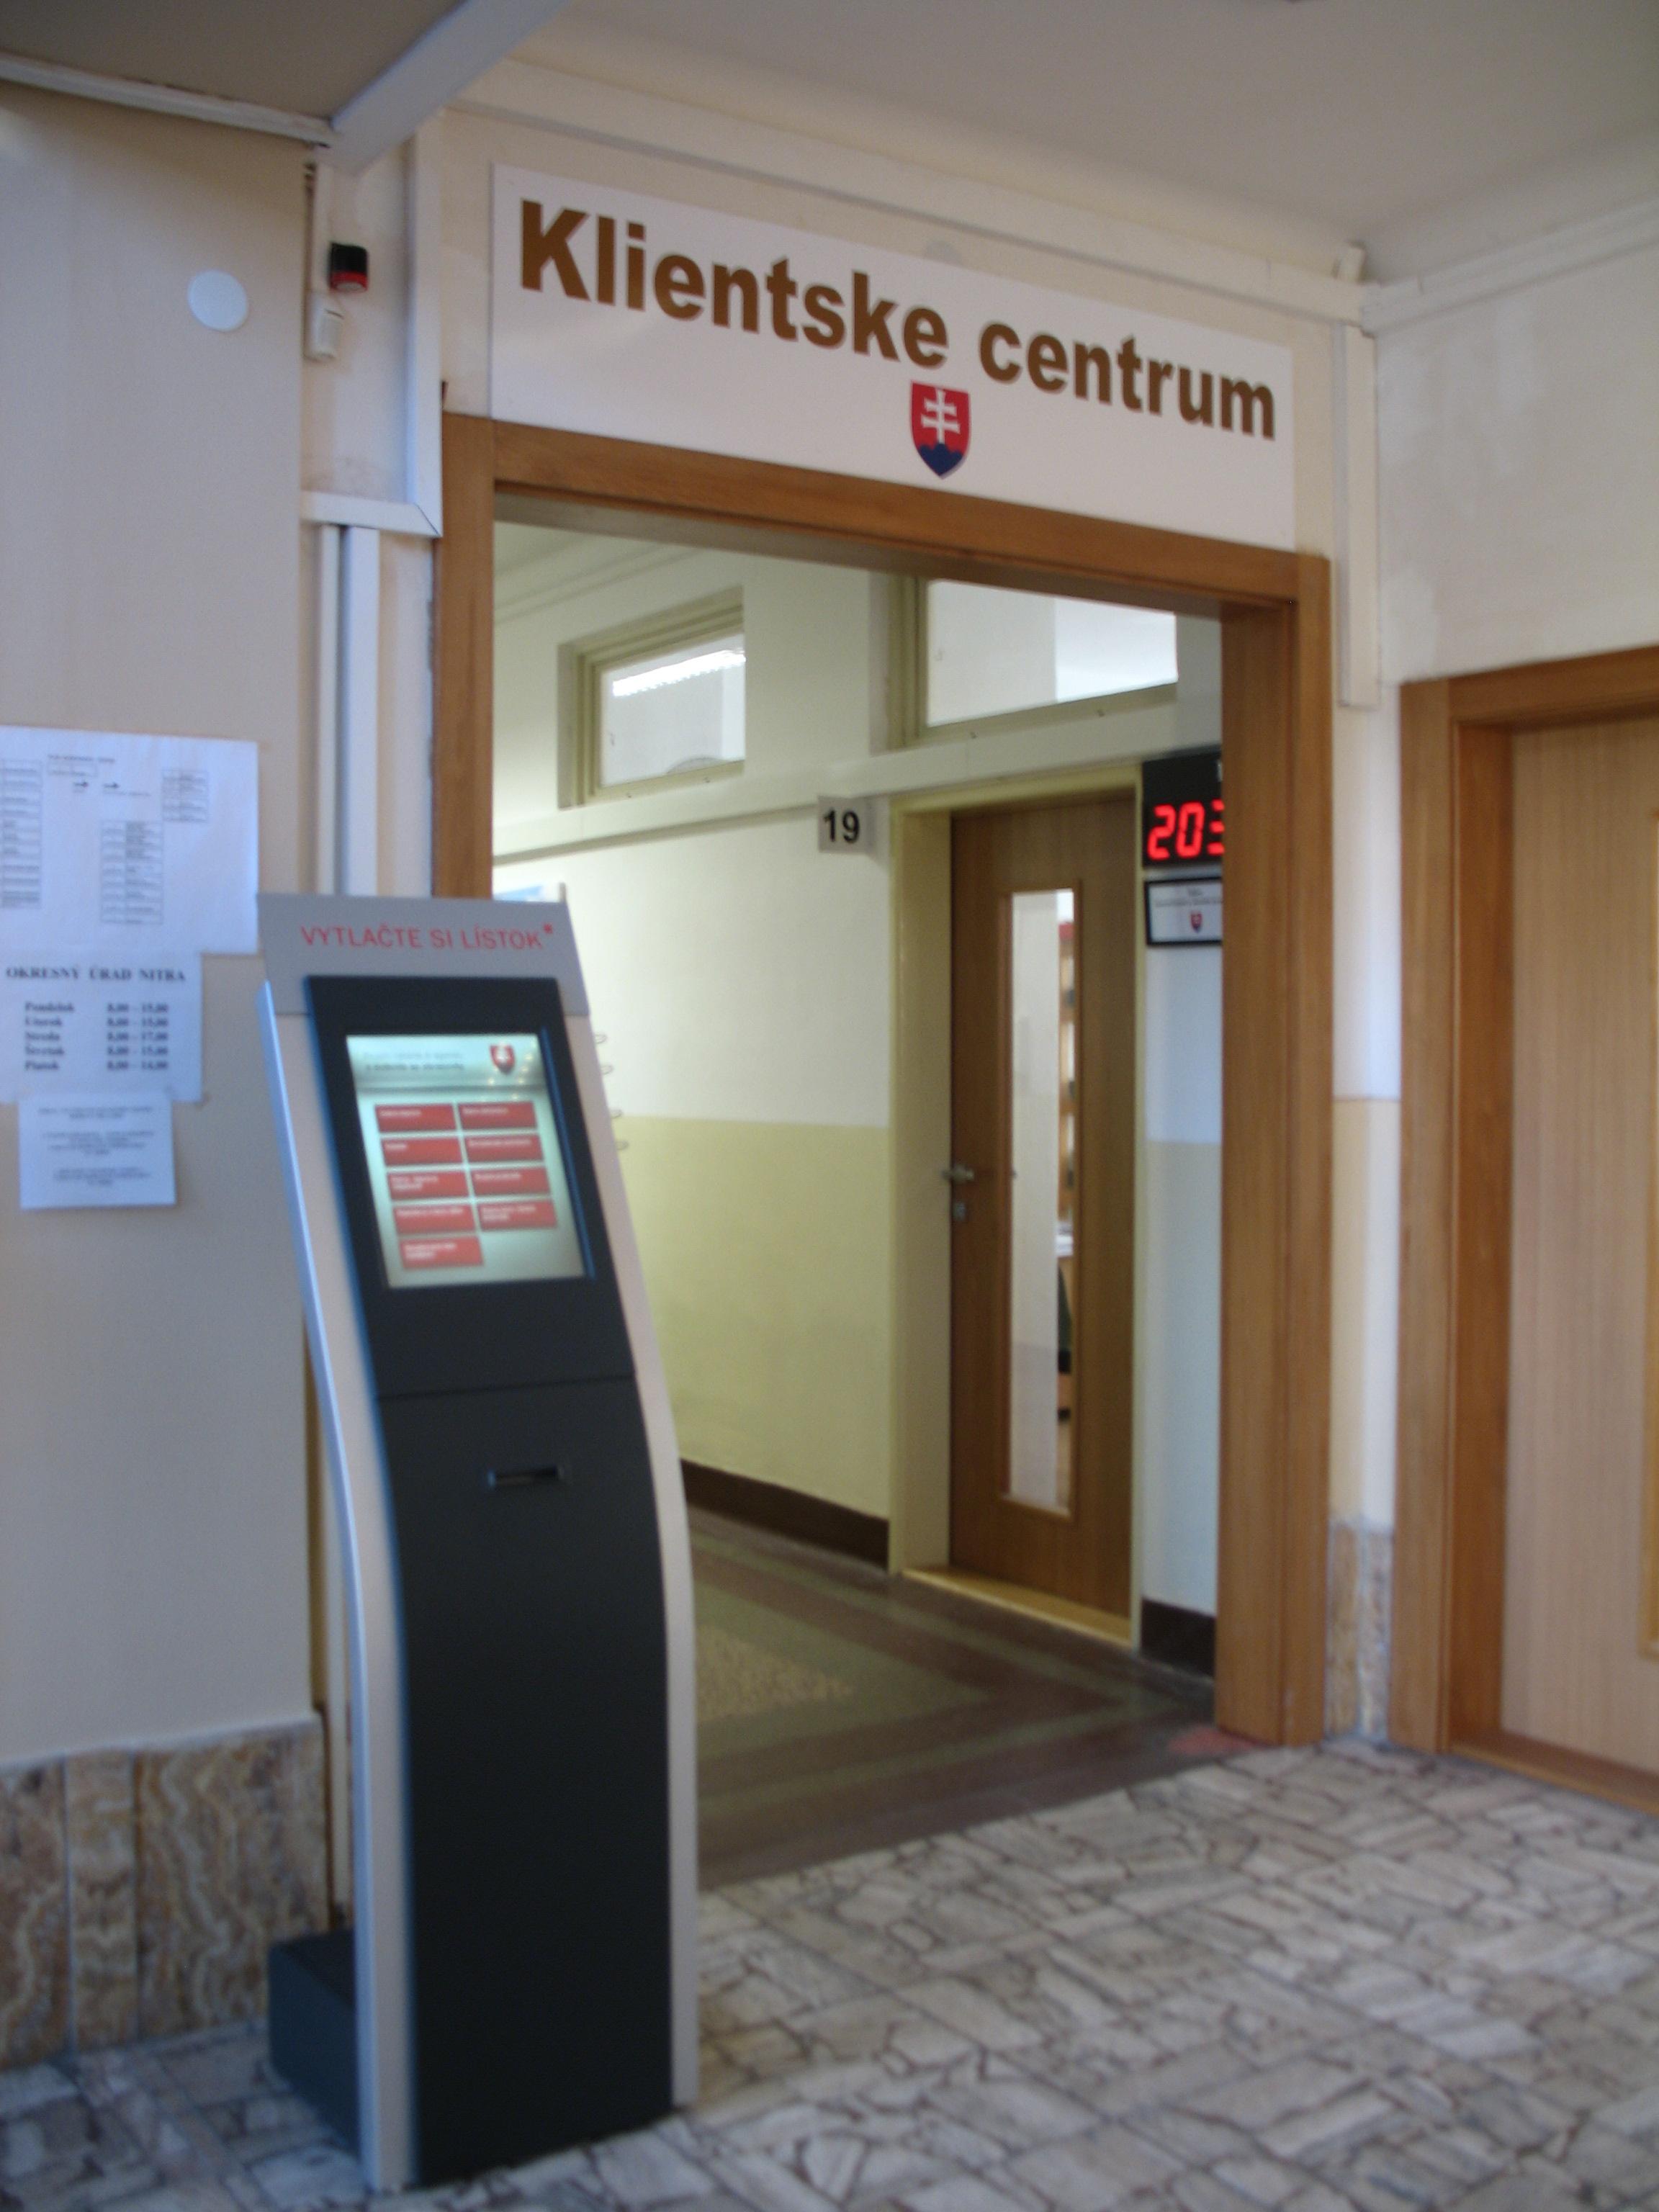 Klienstke centrum